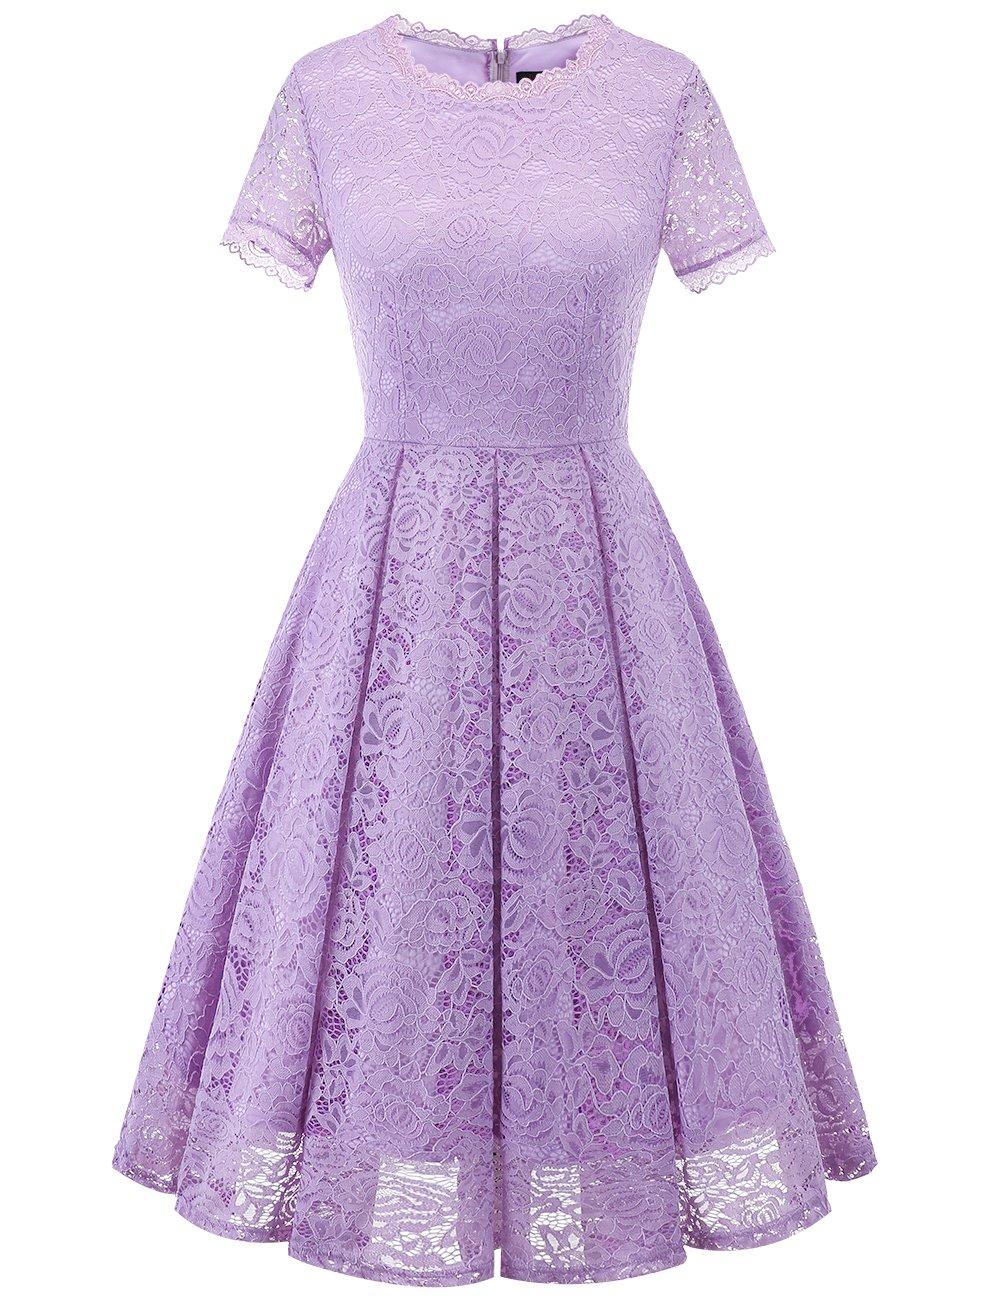 DRESSTELLS Women's Bridesmaid Vintage Tea Dress Floral Lace Cocktail Formal Swing Dress Lavender XL